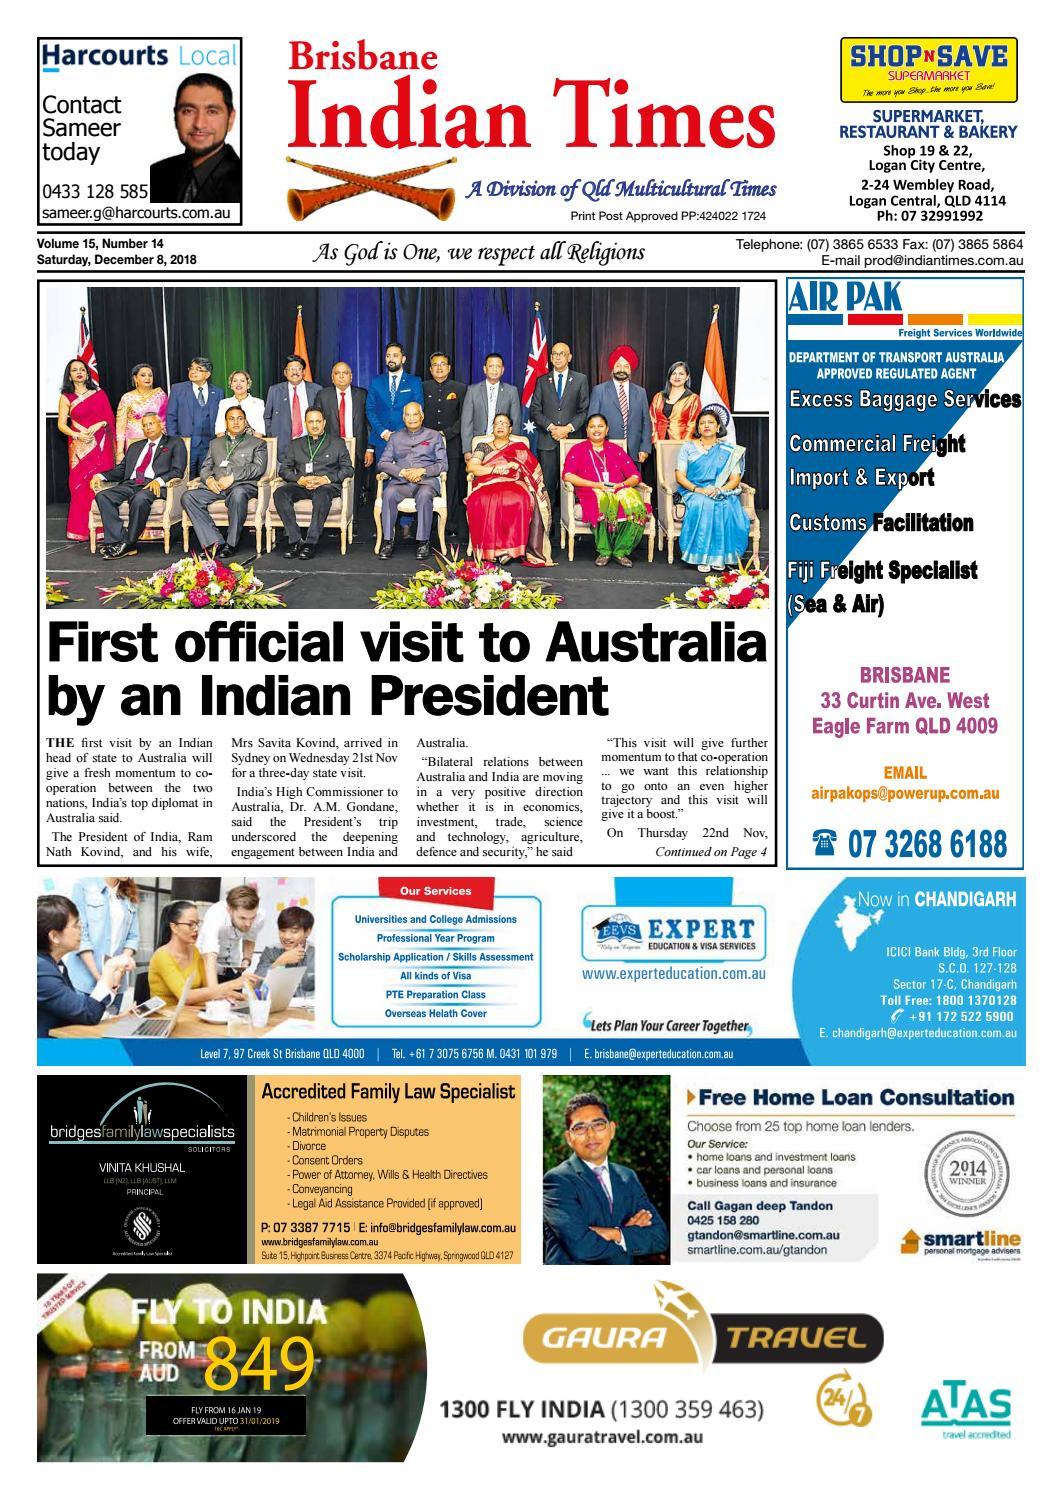 Brisbane Indian Times - December 2018 by Umesh Chandra - issuu